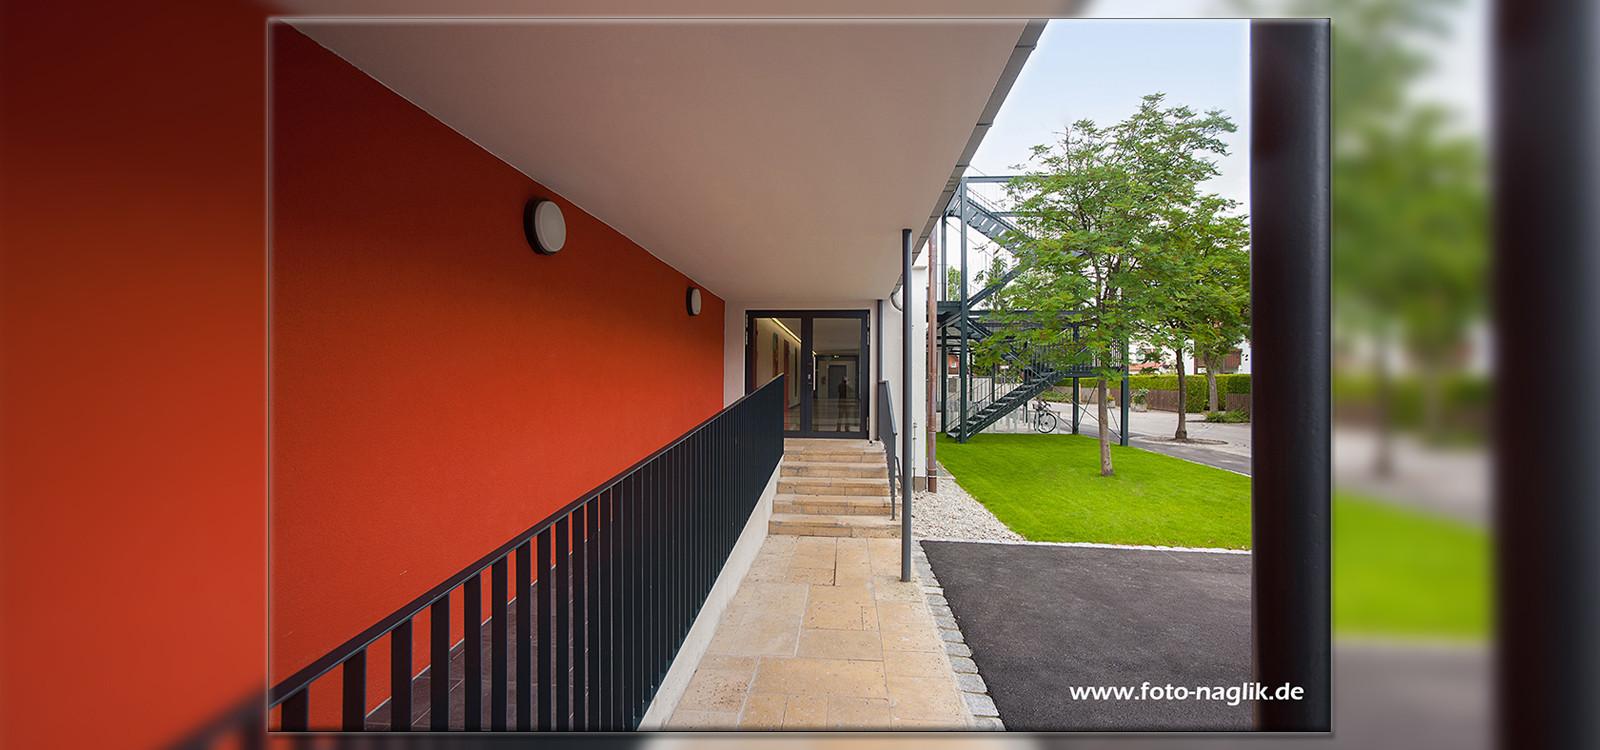 Naglik-Foto-Erding-Architektur-11 Kopie